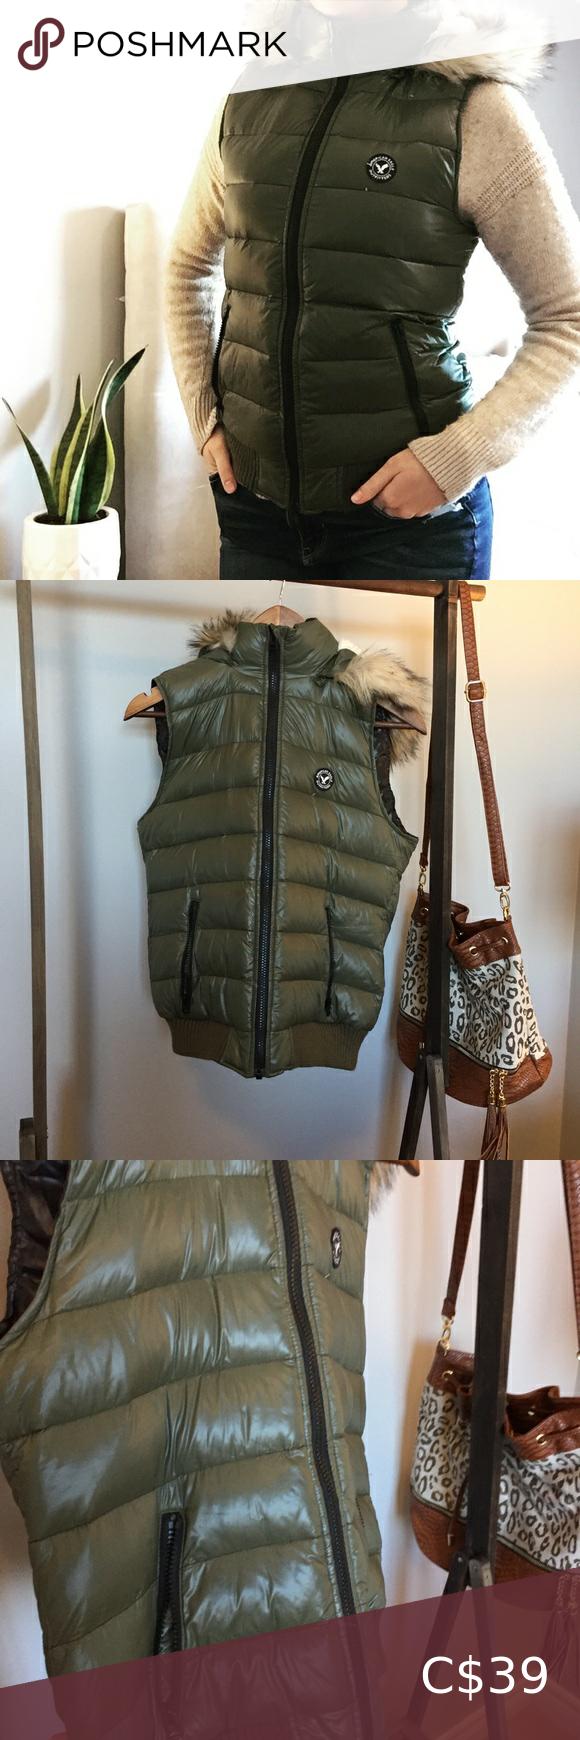 American Eagle Puffer Vest